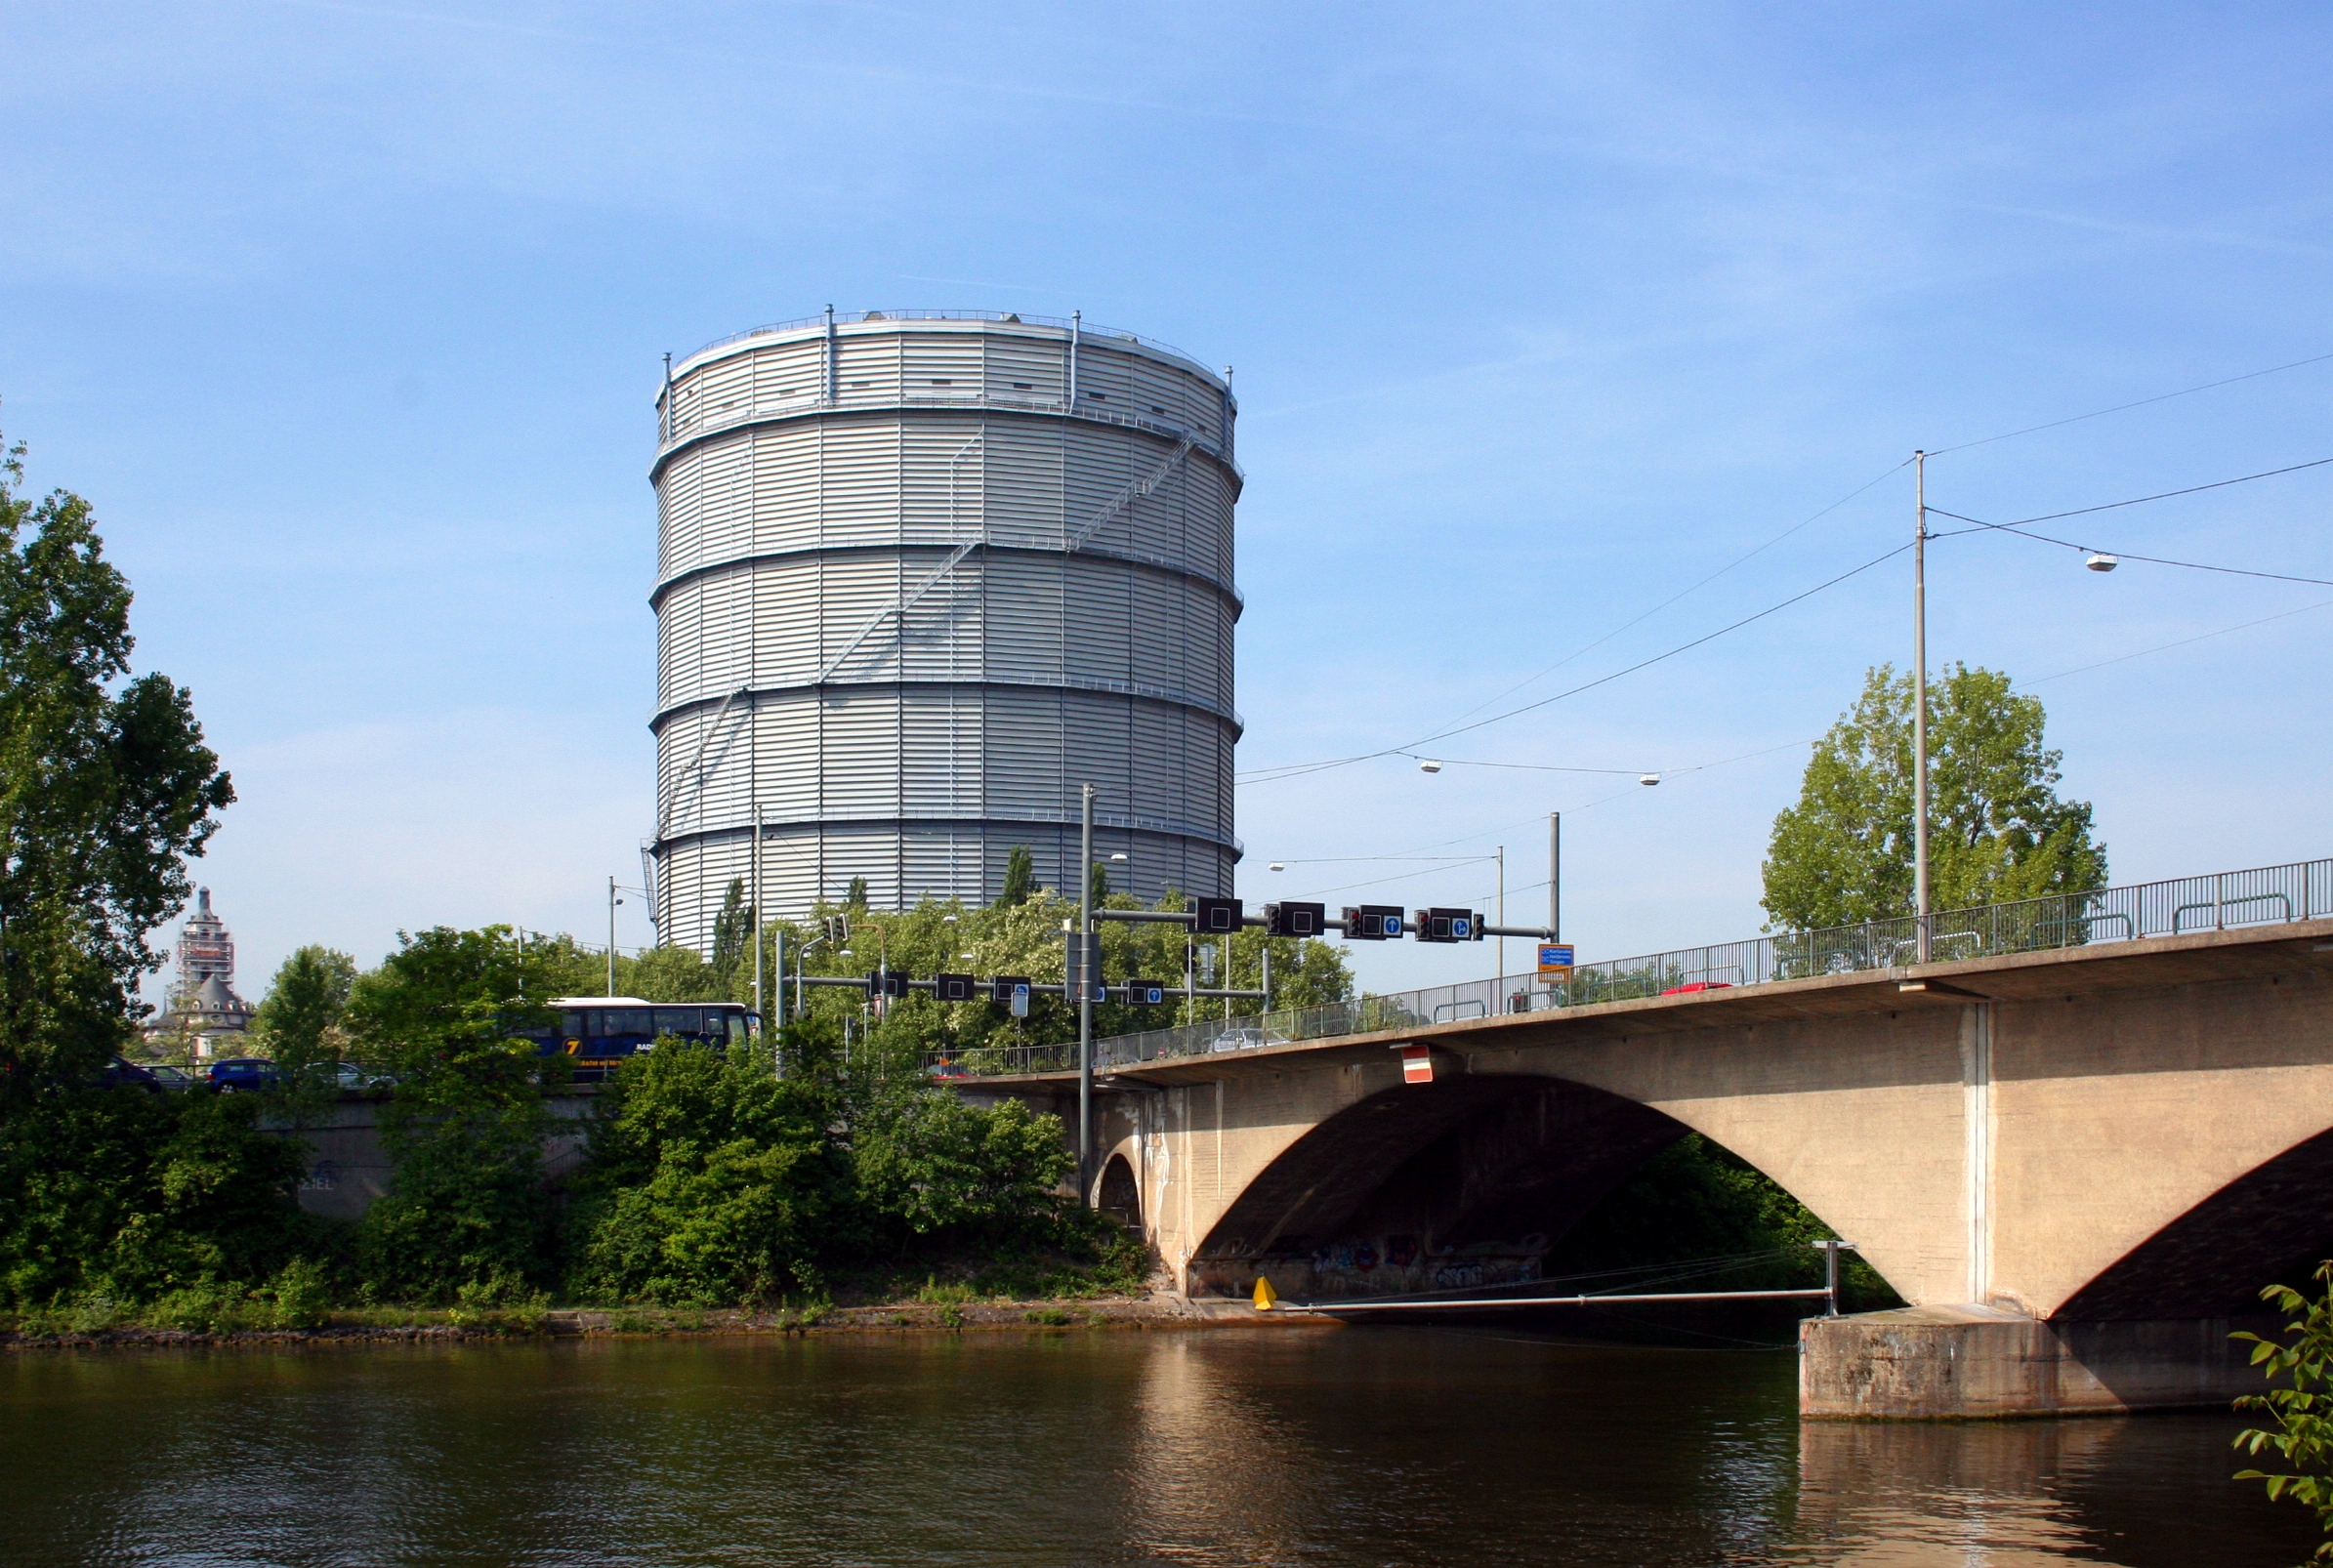 File:Gaisburger Bruecke Gaskessel Stuttgart.jpg - Wikimedia Commons